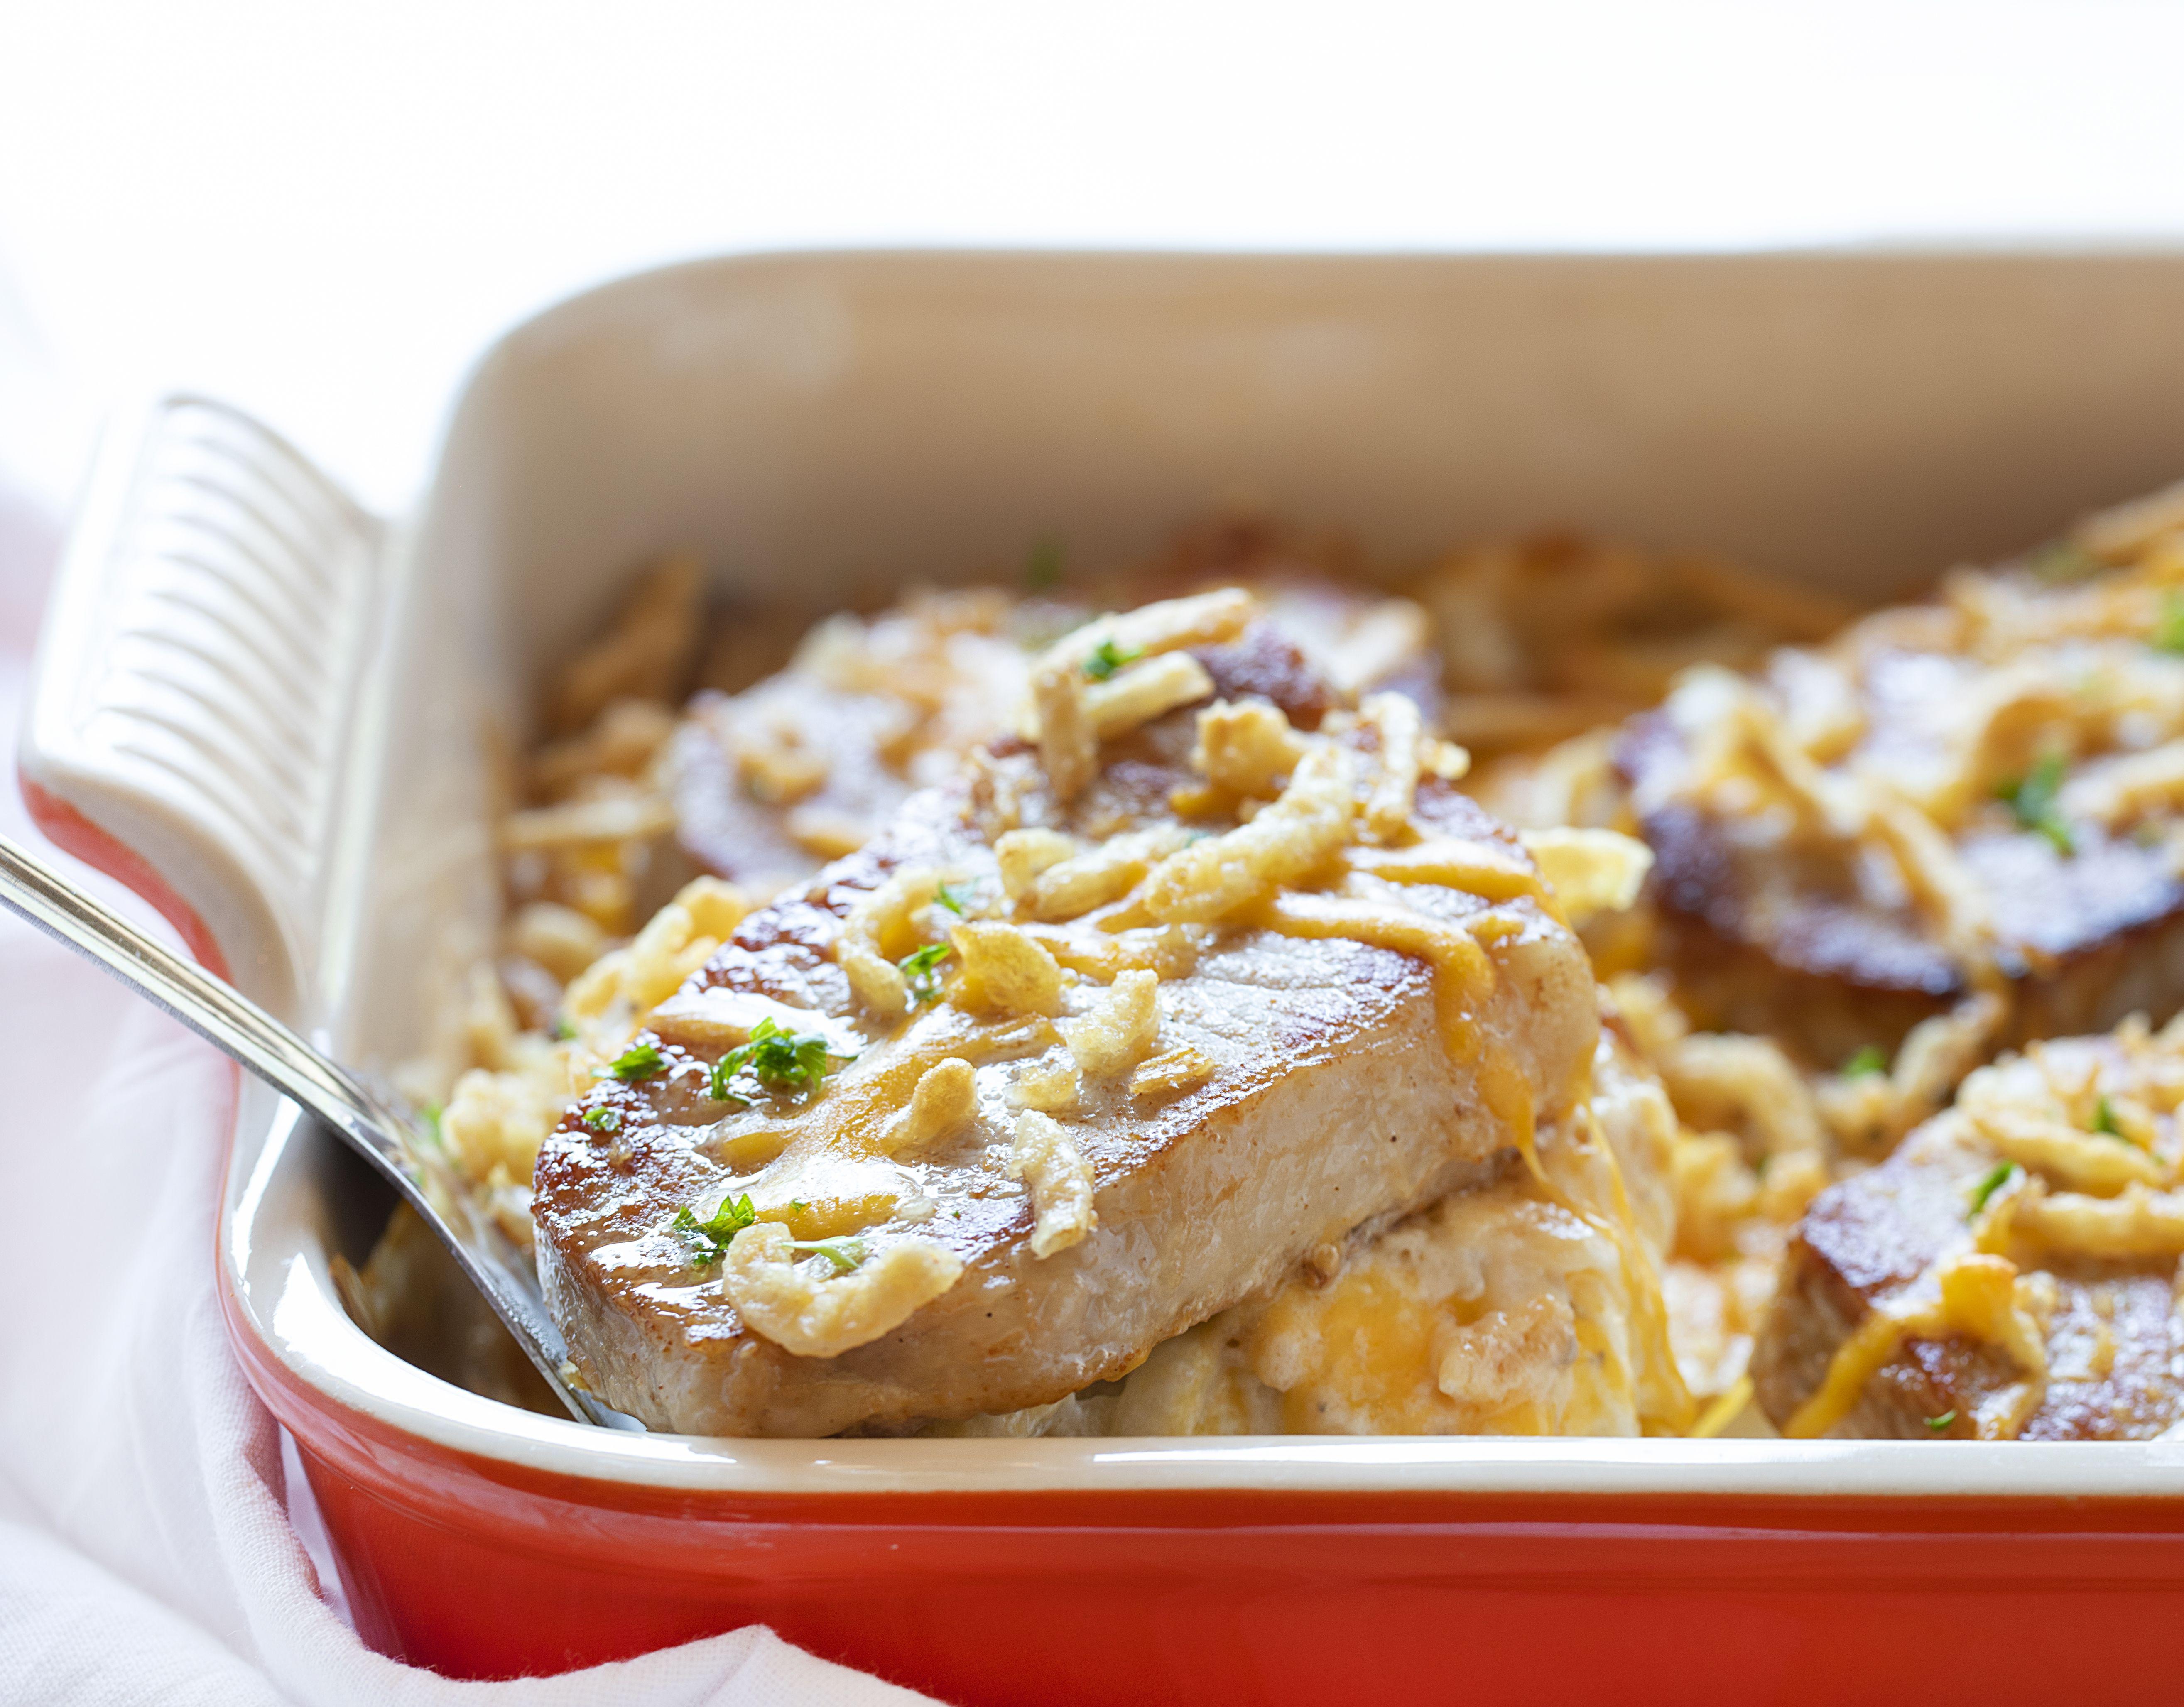 Pork Chop Casserole Recipe Pork Chop Casserole Pork Chops Pork Casserole